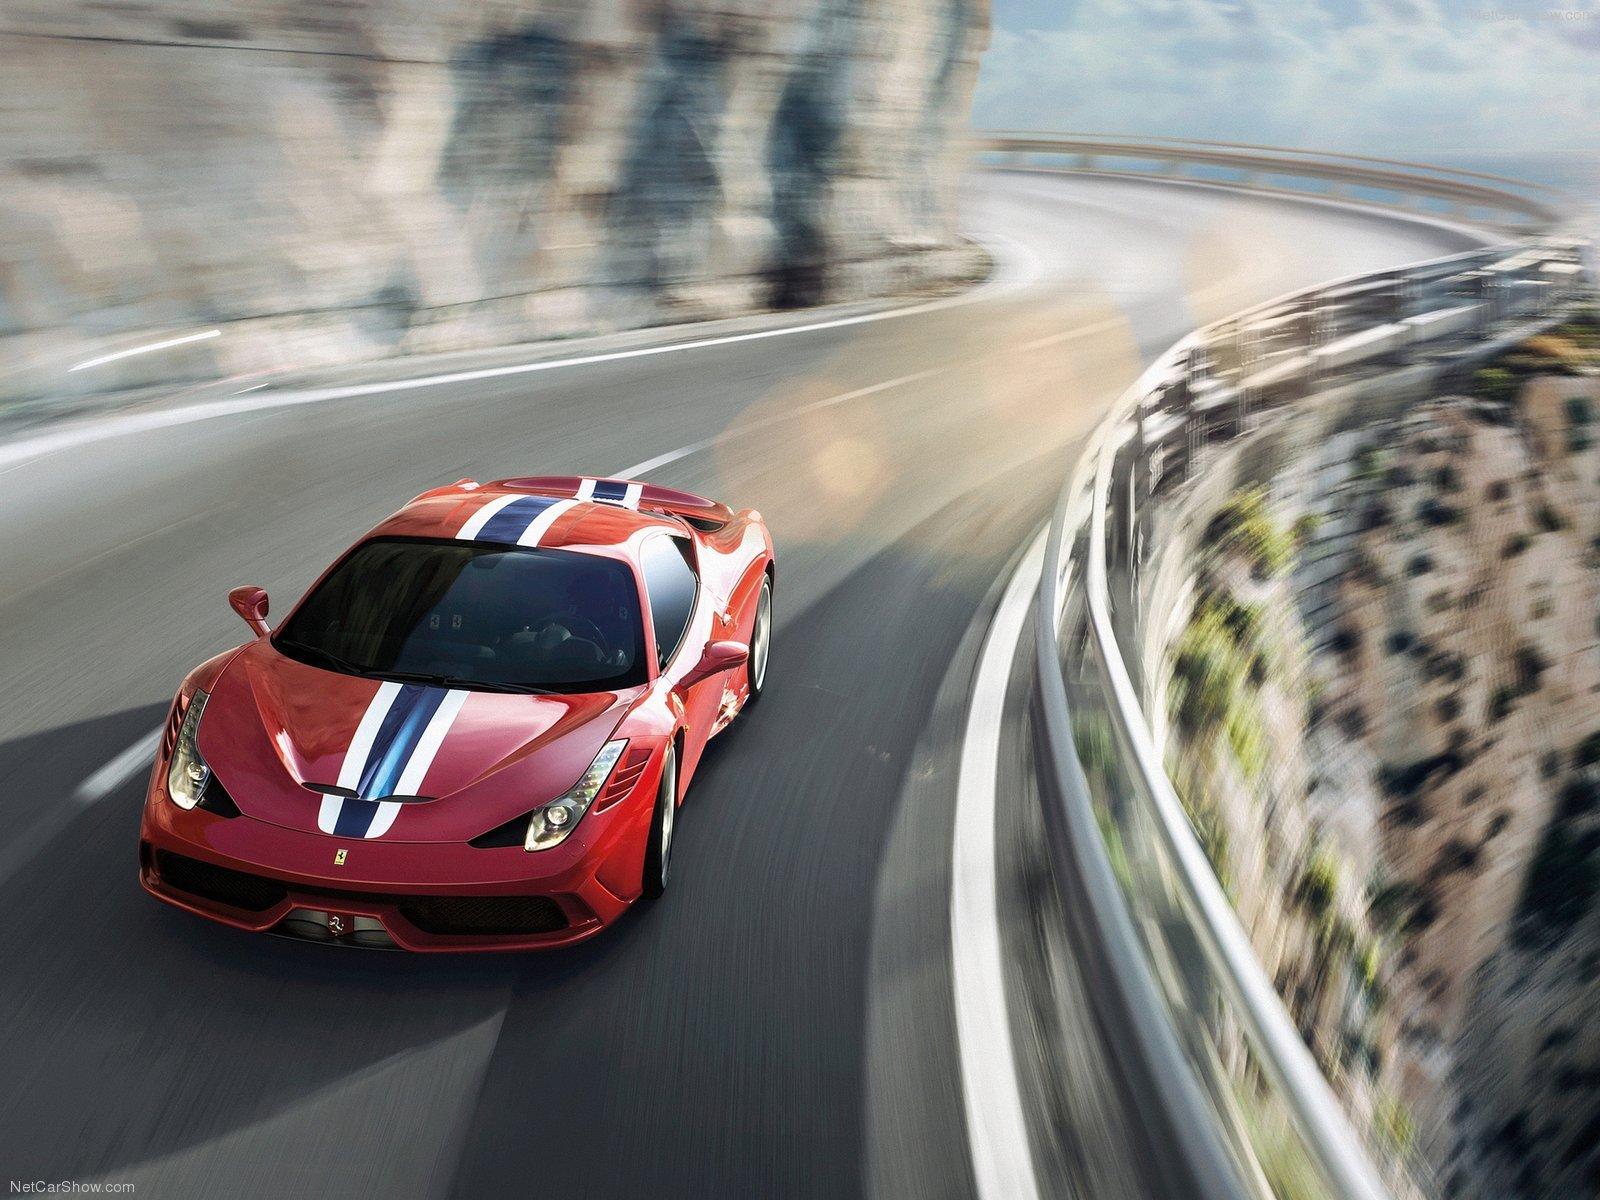 Ferrari 458 Speciale Wallpaper Ferrari 458 Speciale 2014